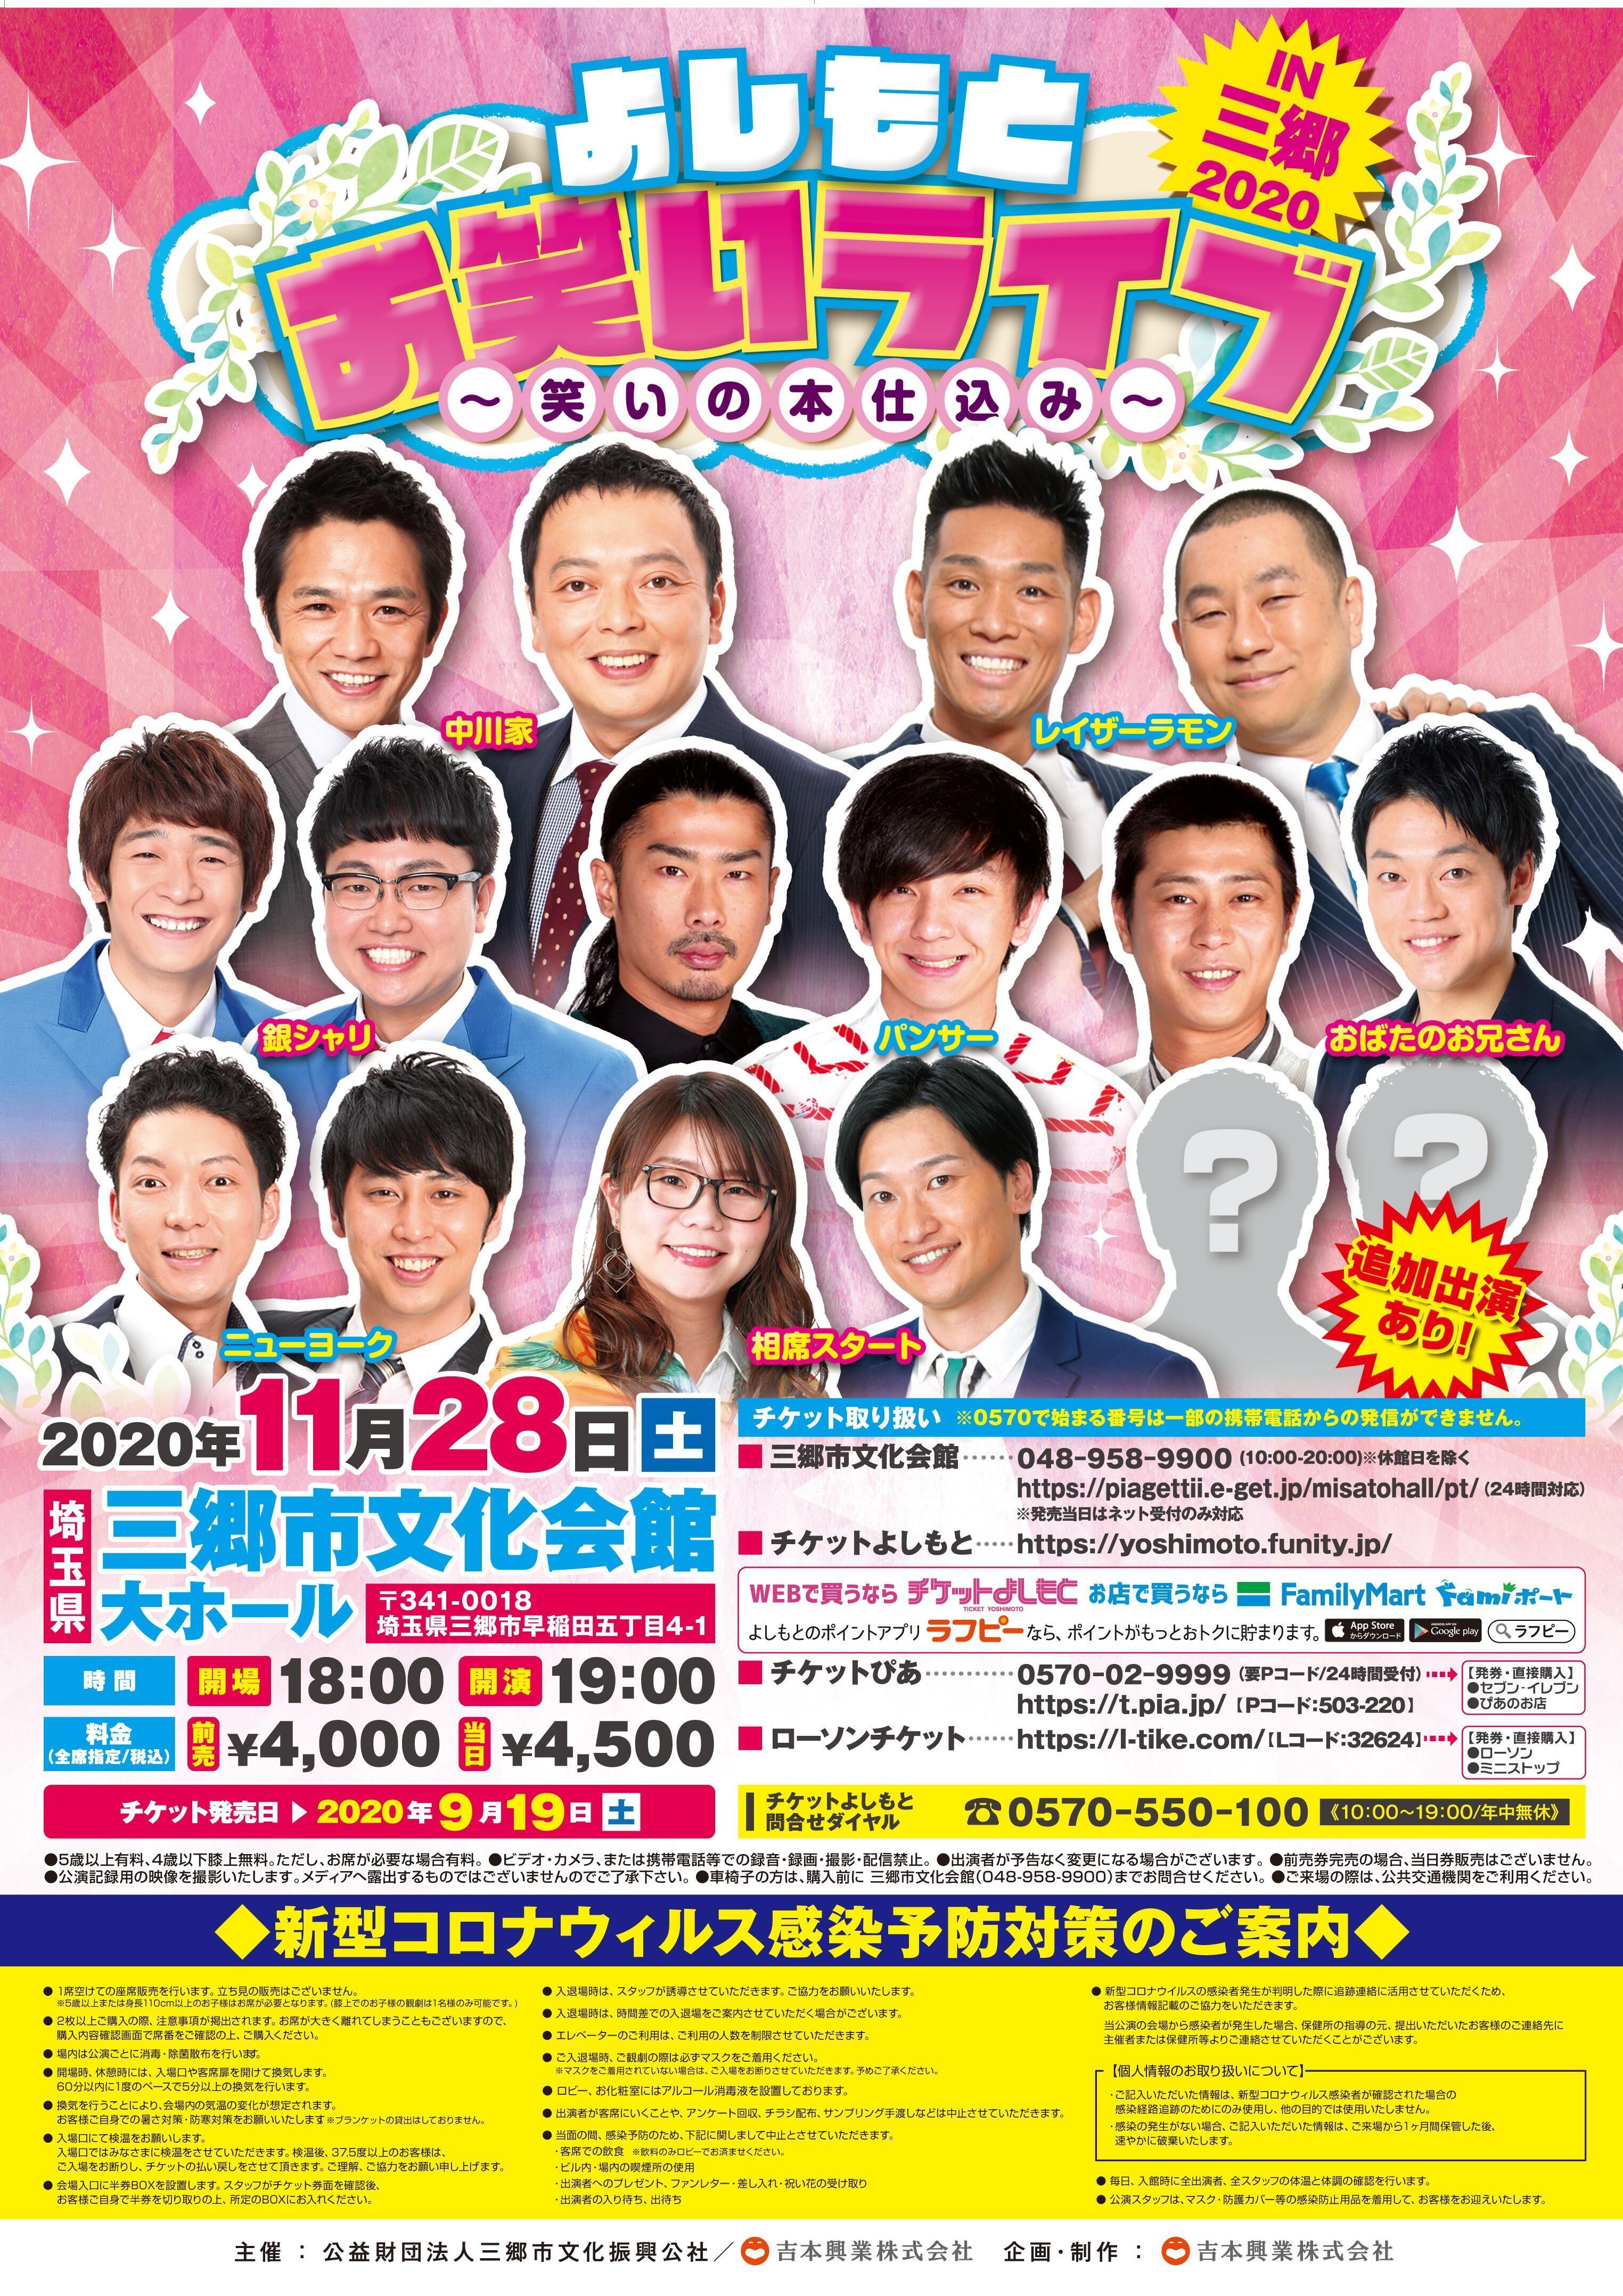 http://www.syumatsu.jp/20200916152709-9a340a940899e15bcc6c32cc980f06b0af45274e.jpg